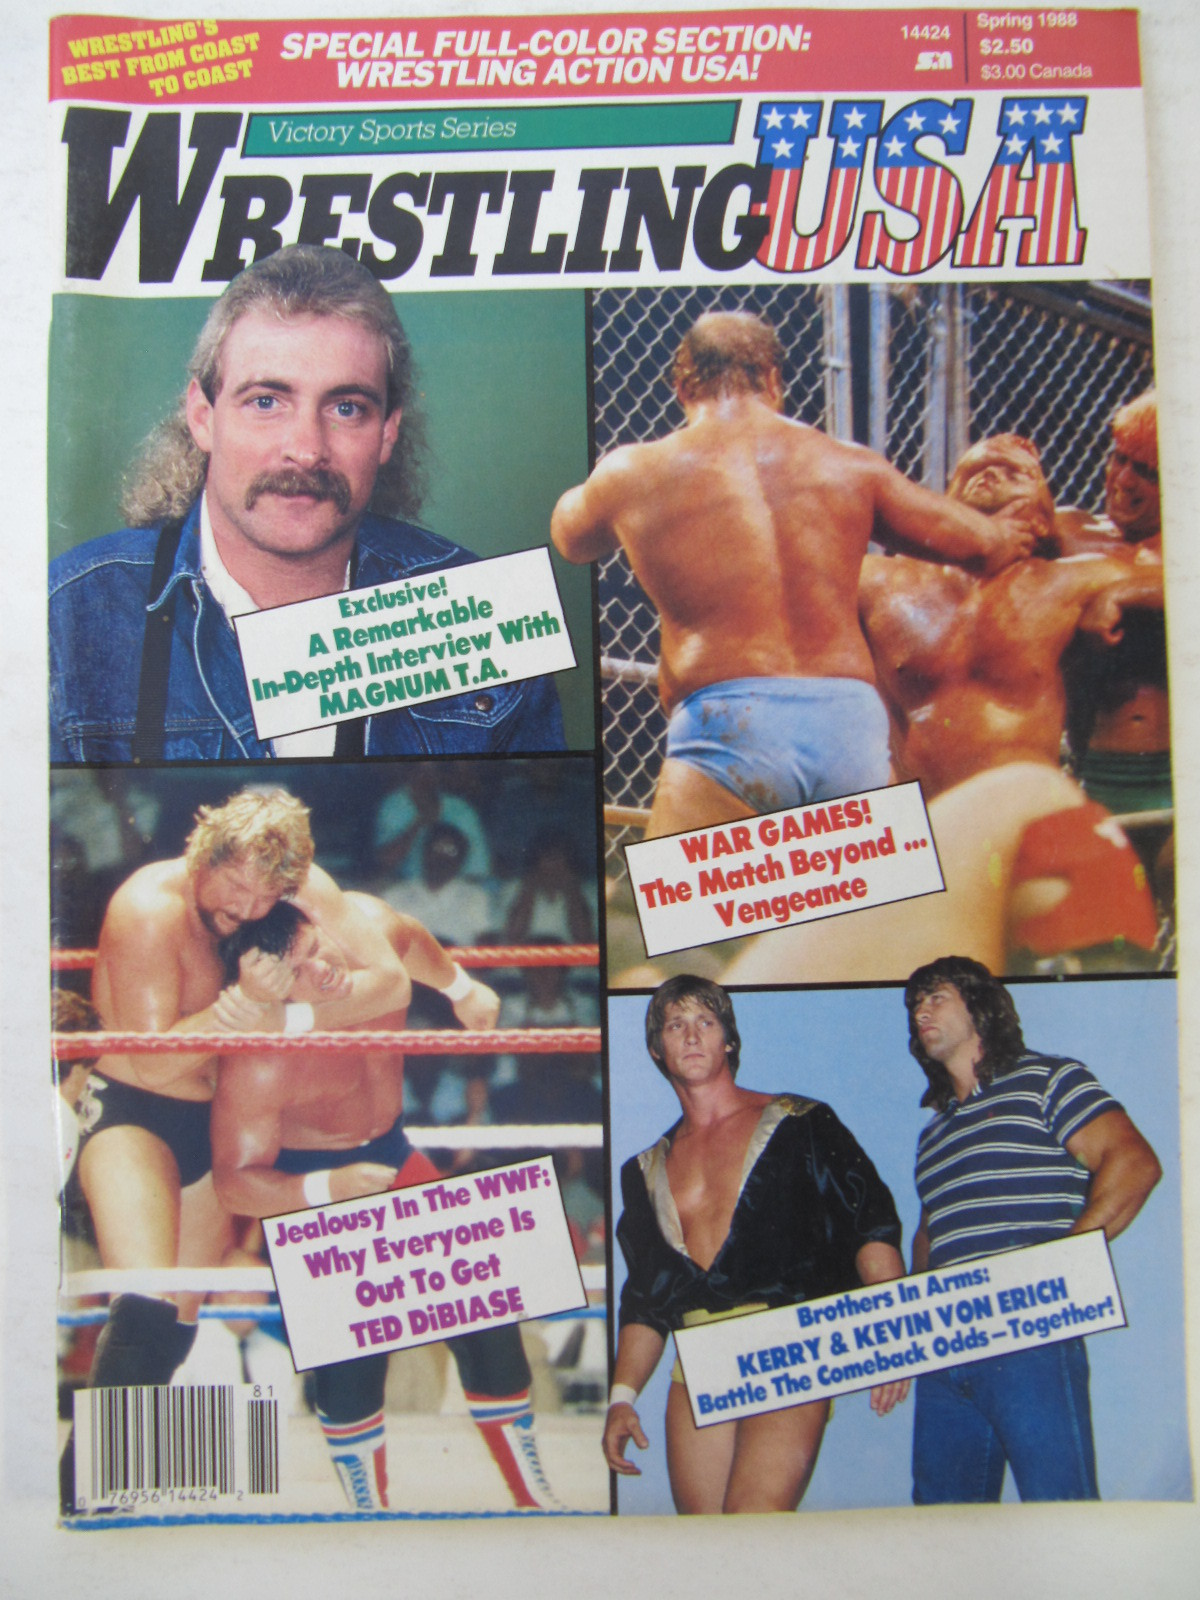 Wrestling USA - Spring 1988